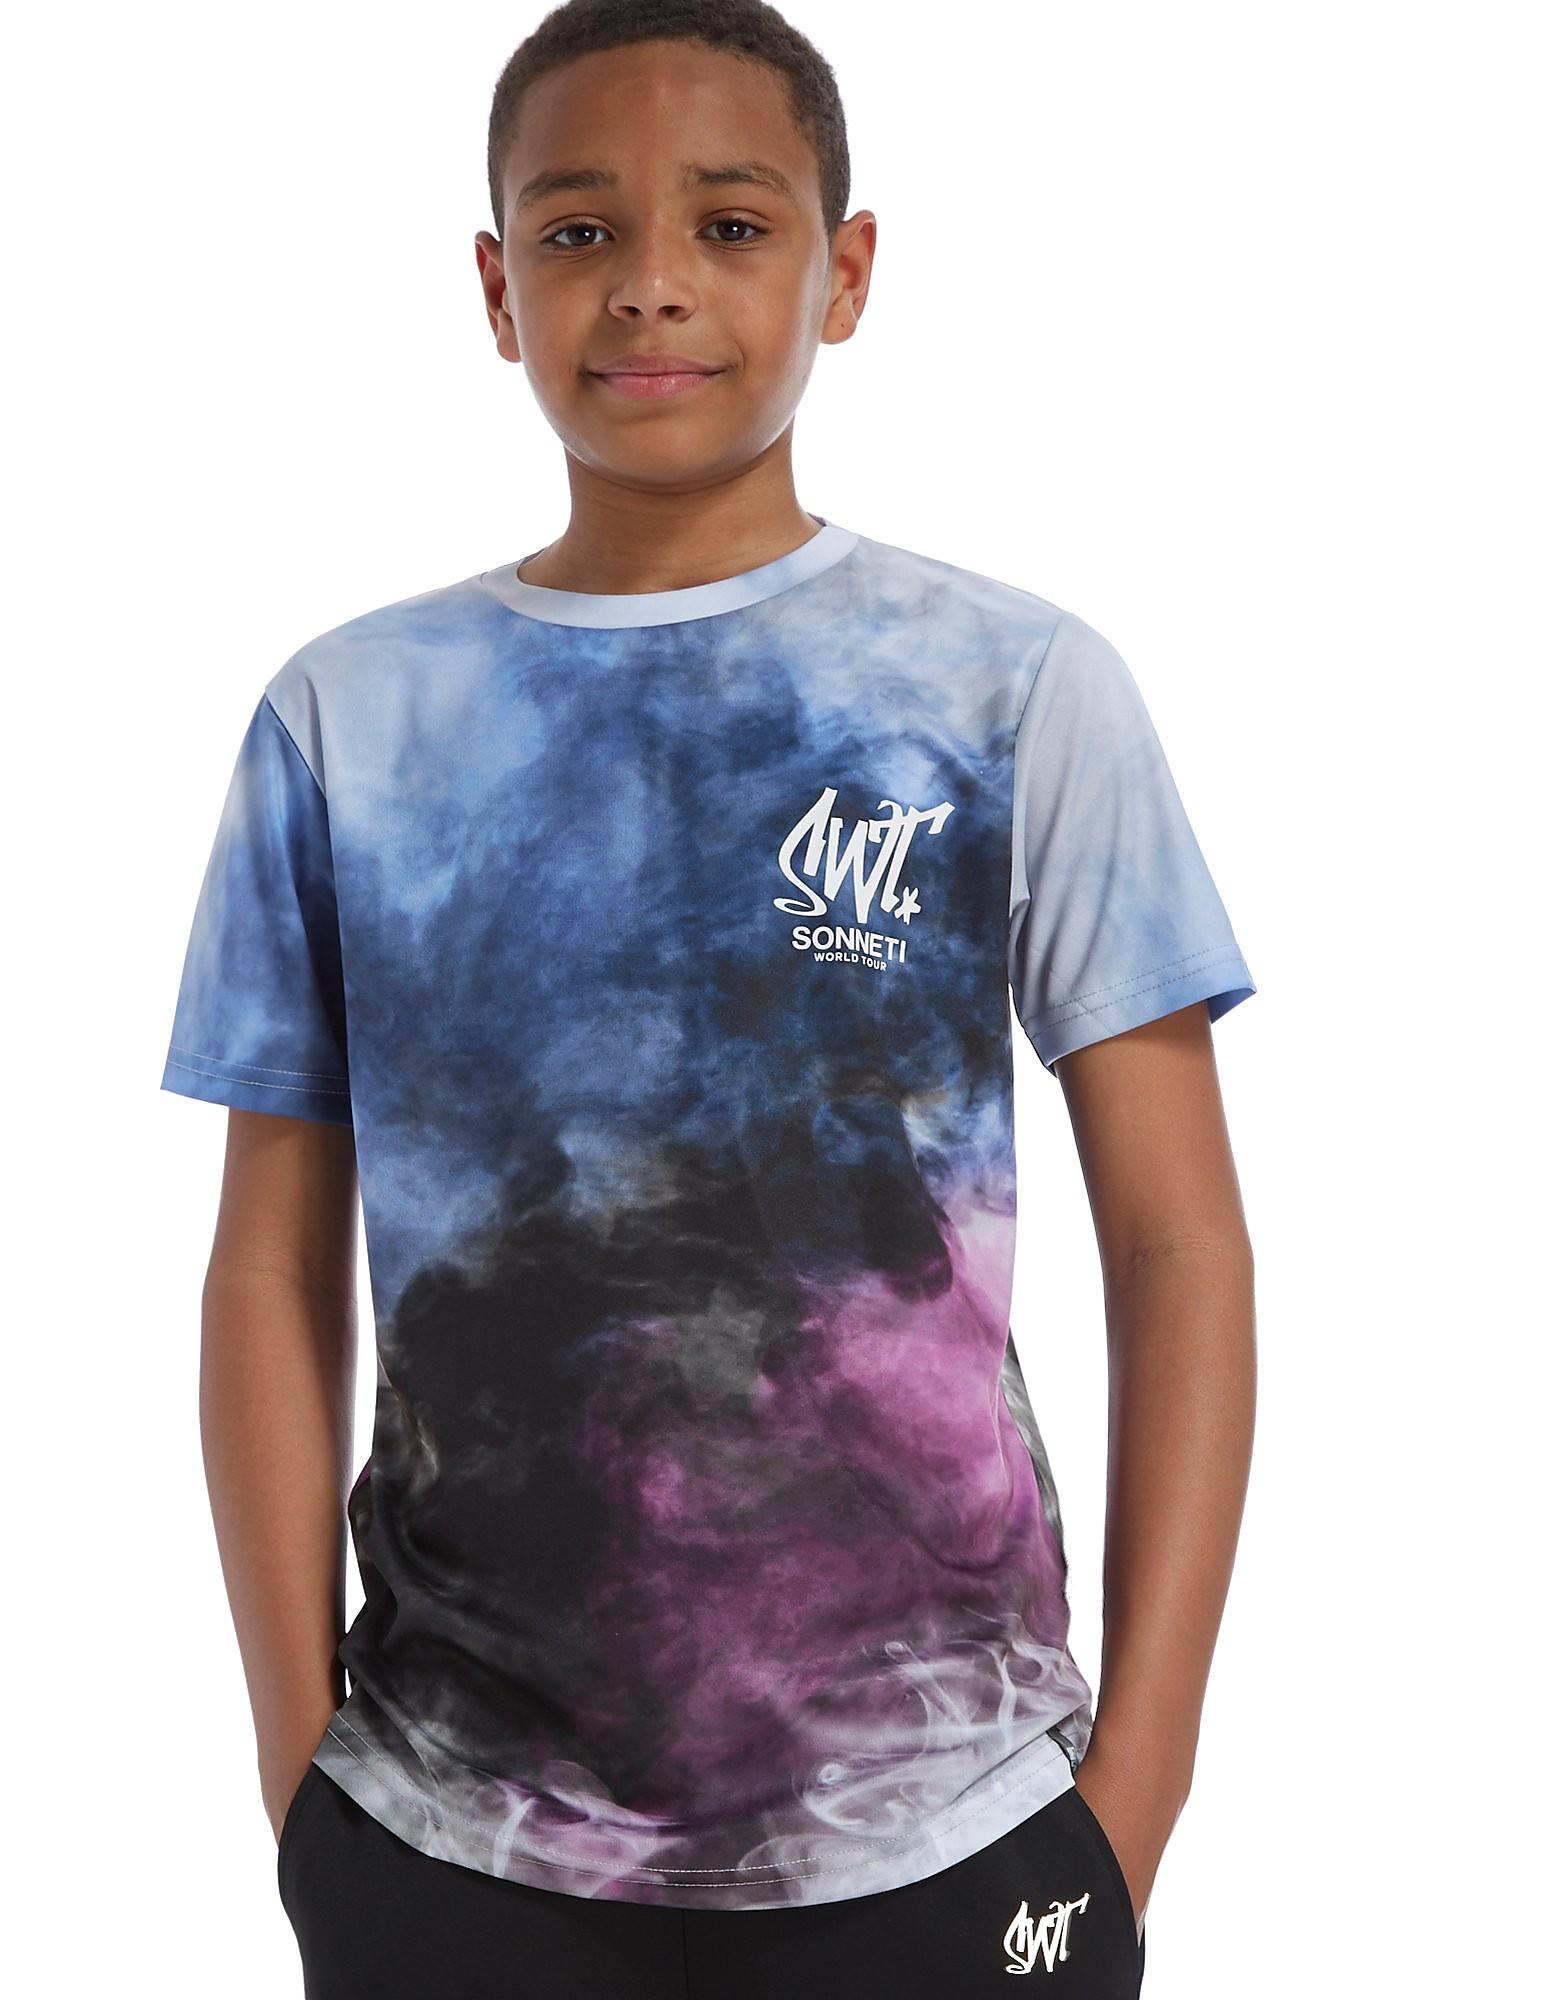 Sonneti Aftermath T-Shirt Junior